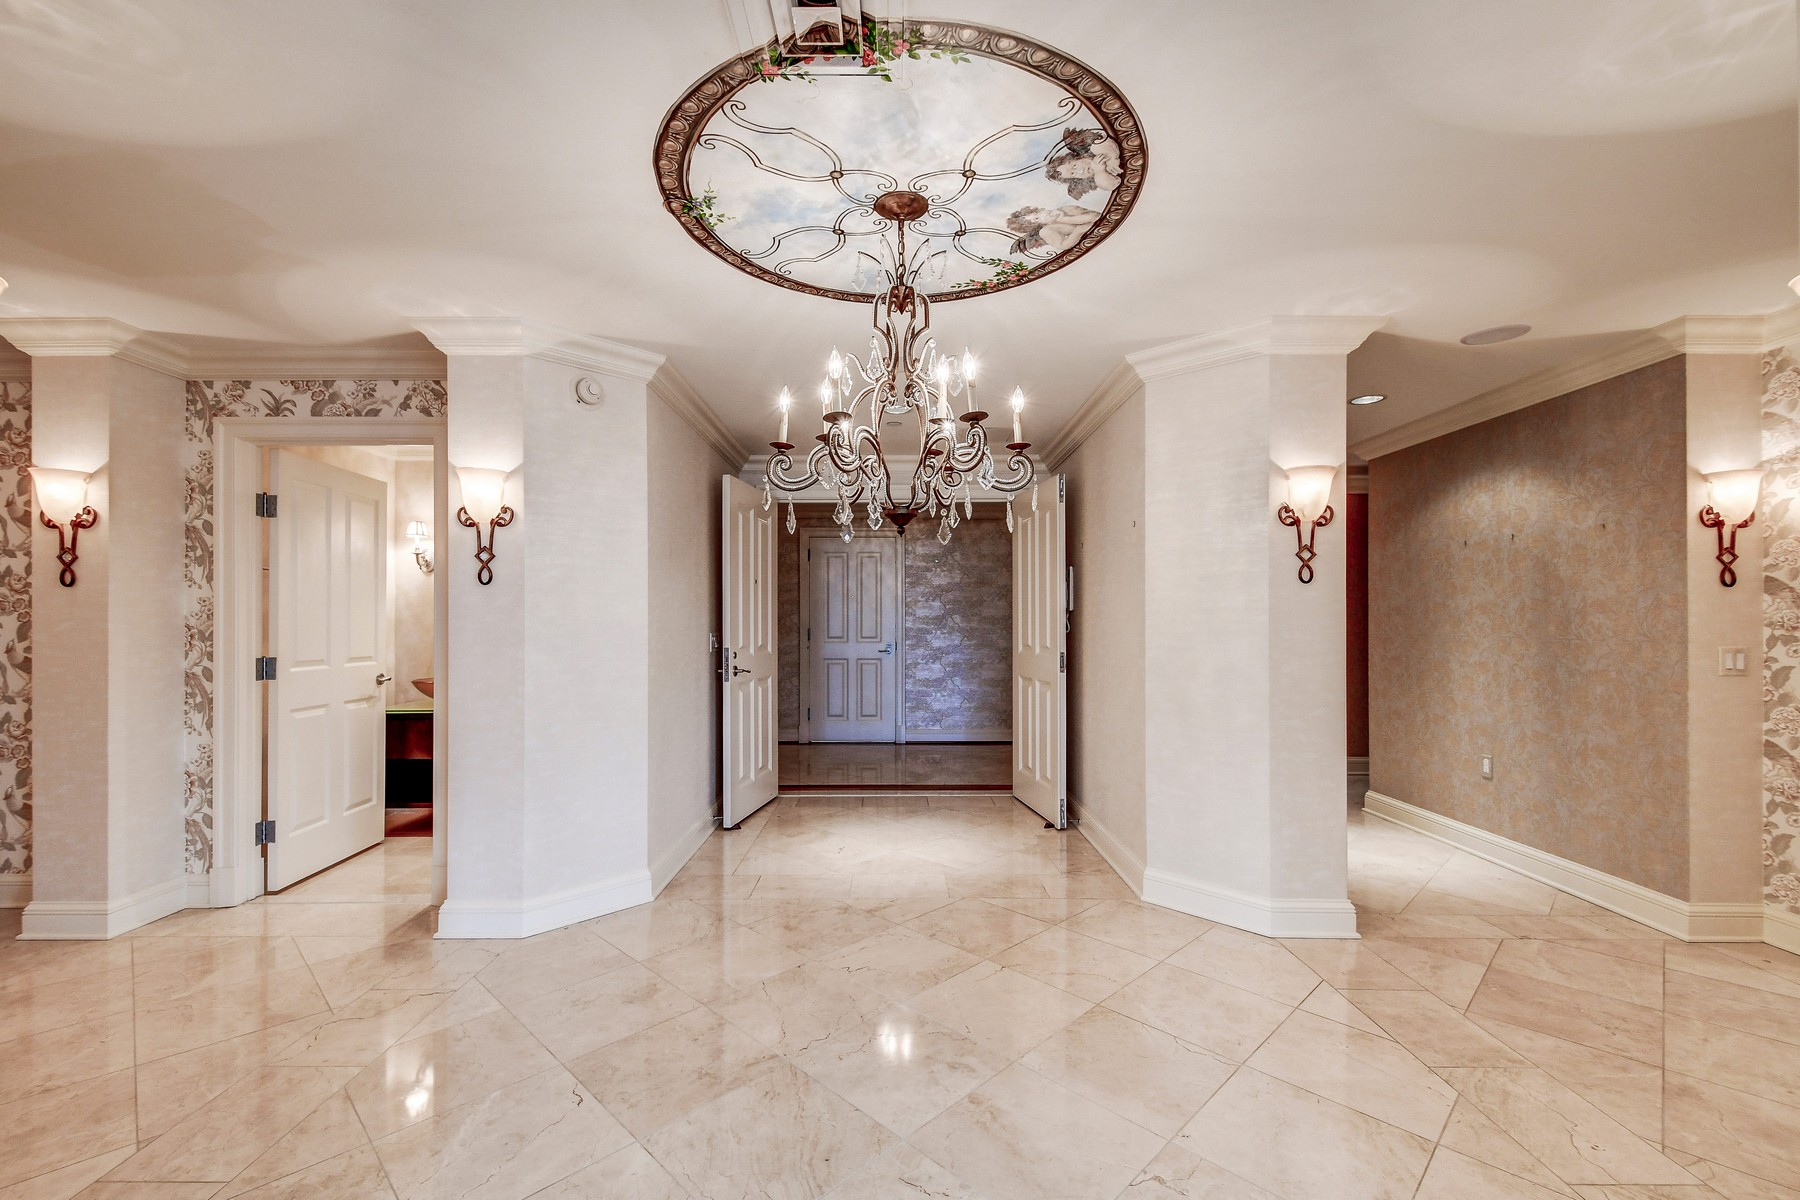 Condominiums للـ Sale في The Ritz-Carlton Residences 801 Key Highway #P-31, Baltimore, Maryland 21230 United States